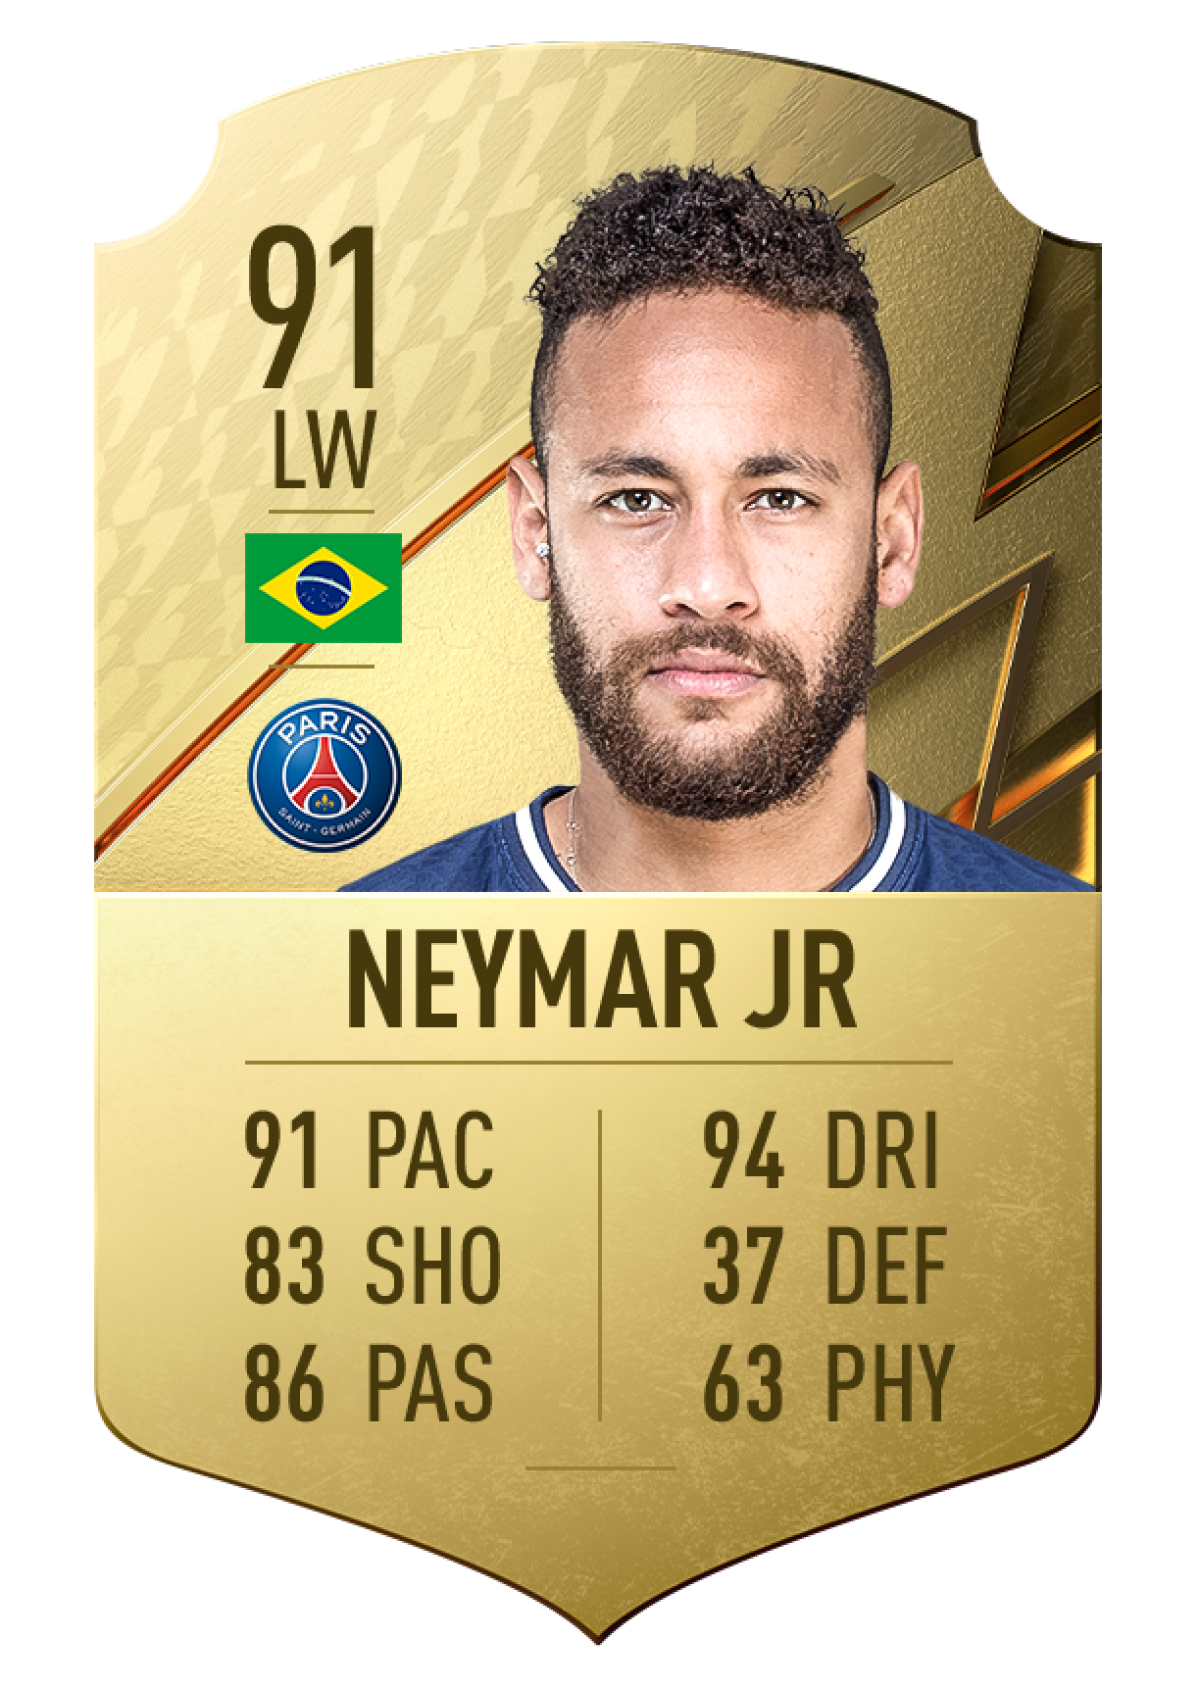 2. Neymar Jr | Paris Saint-Germain | Chỉ số rê bóng 94